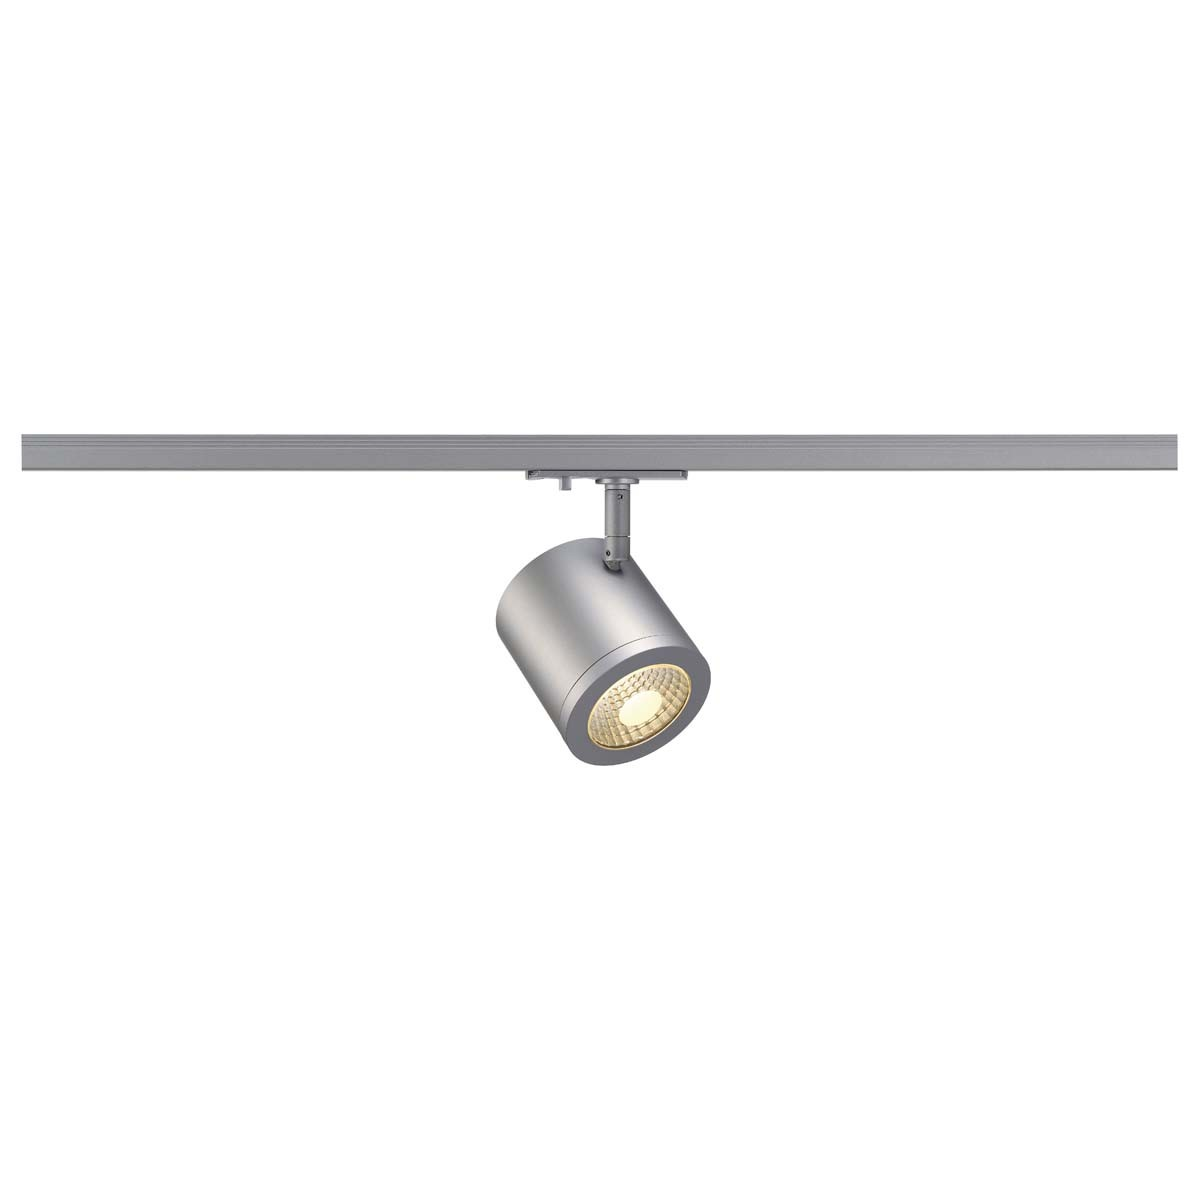 SLV 143954 Enola C LED 9W 3000K 55 Degree Silver Grey 1 Circuit 240V Track Light